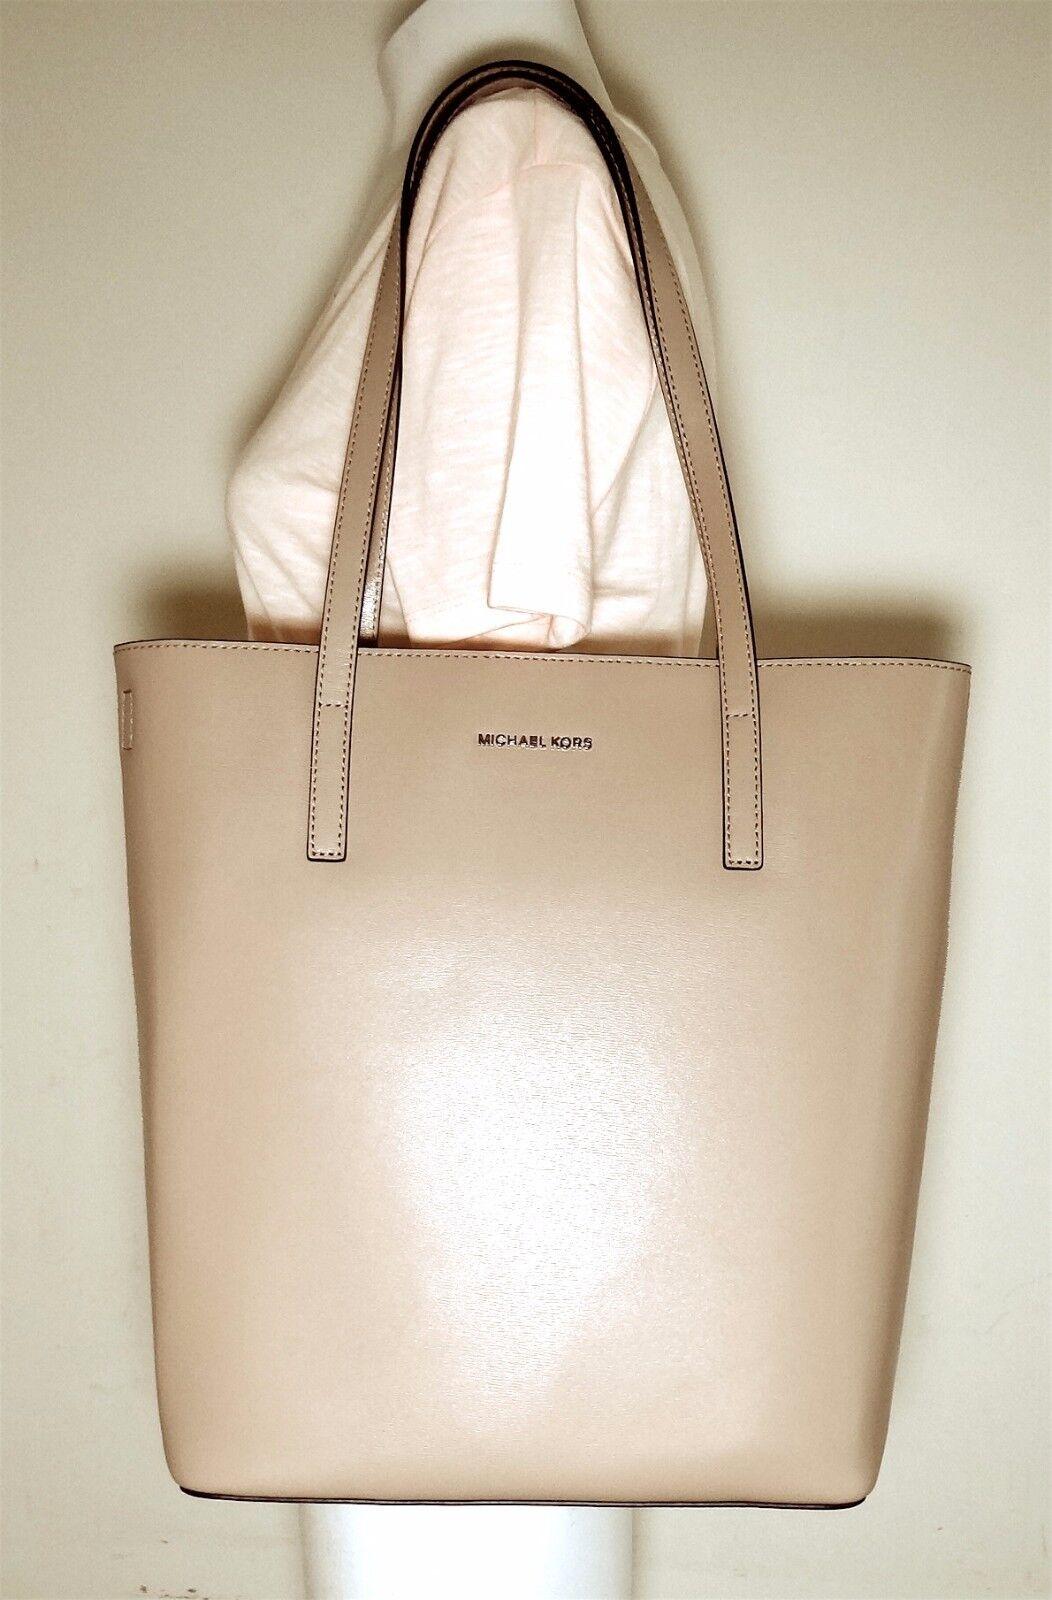 cef152e67f02 Michael Kors Bag/handbag/bag Emry LG NS Tote Bag LOOK White Model 2016 for  sale online | eBay